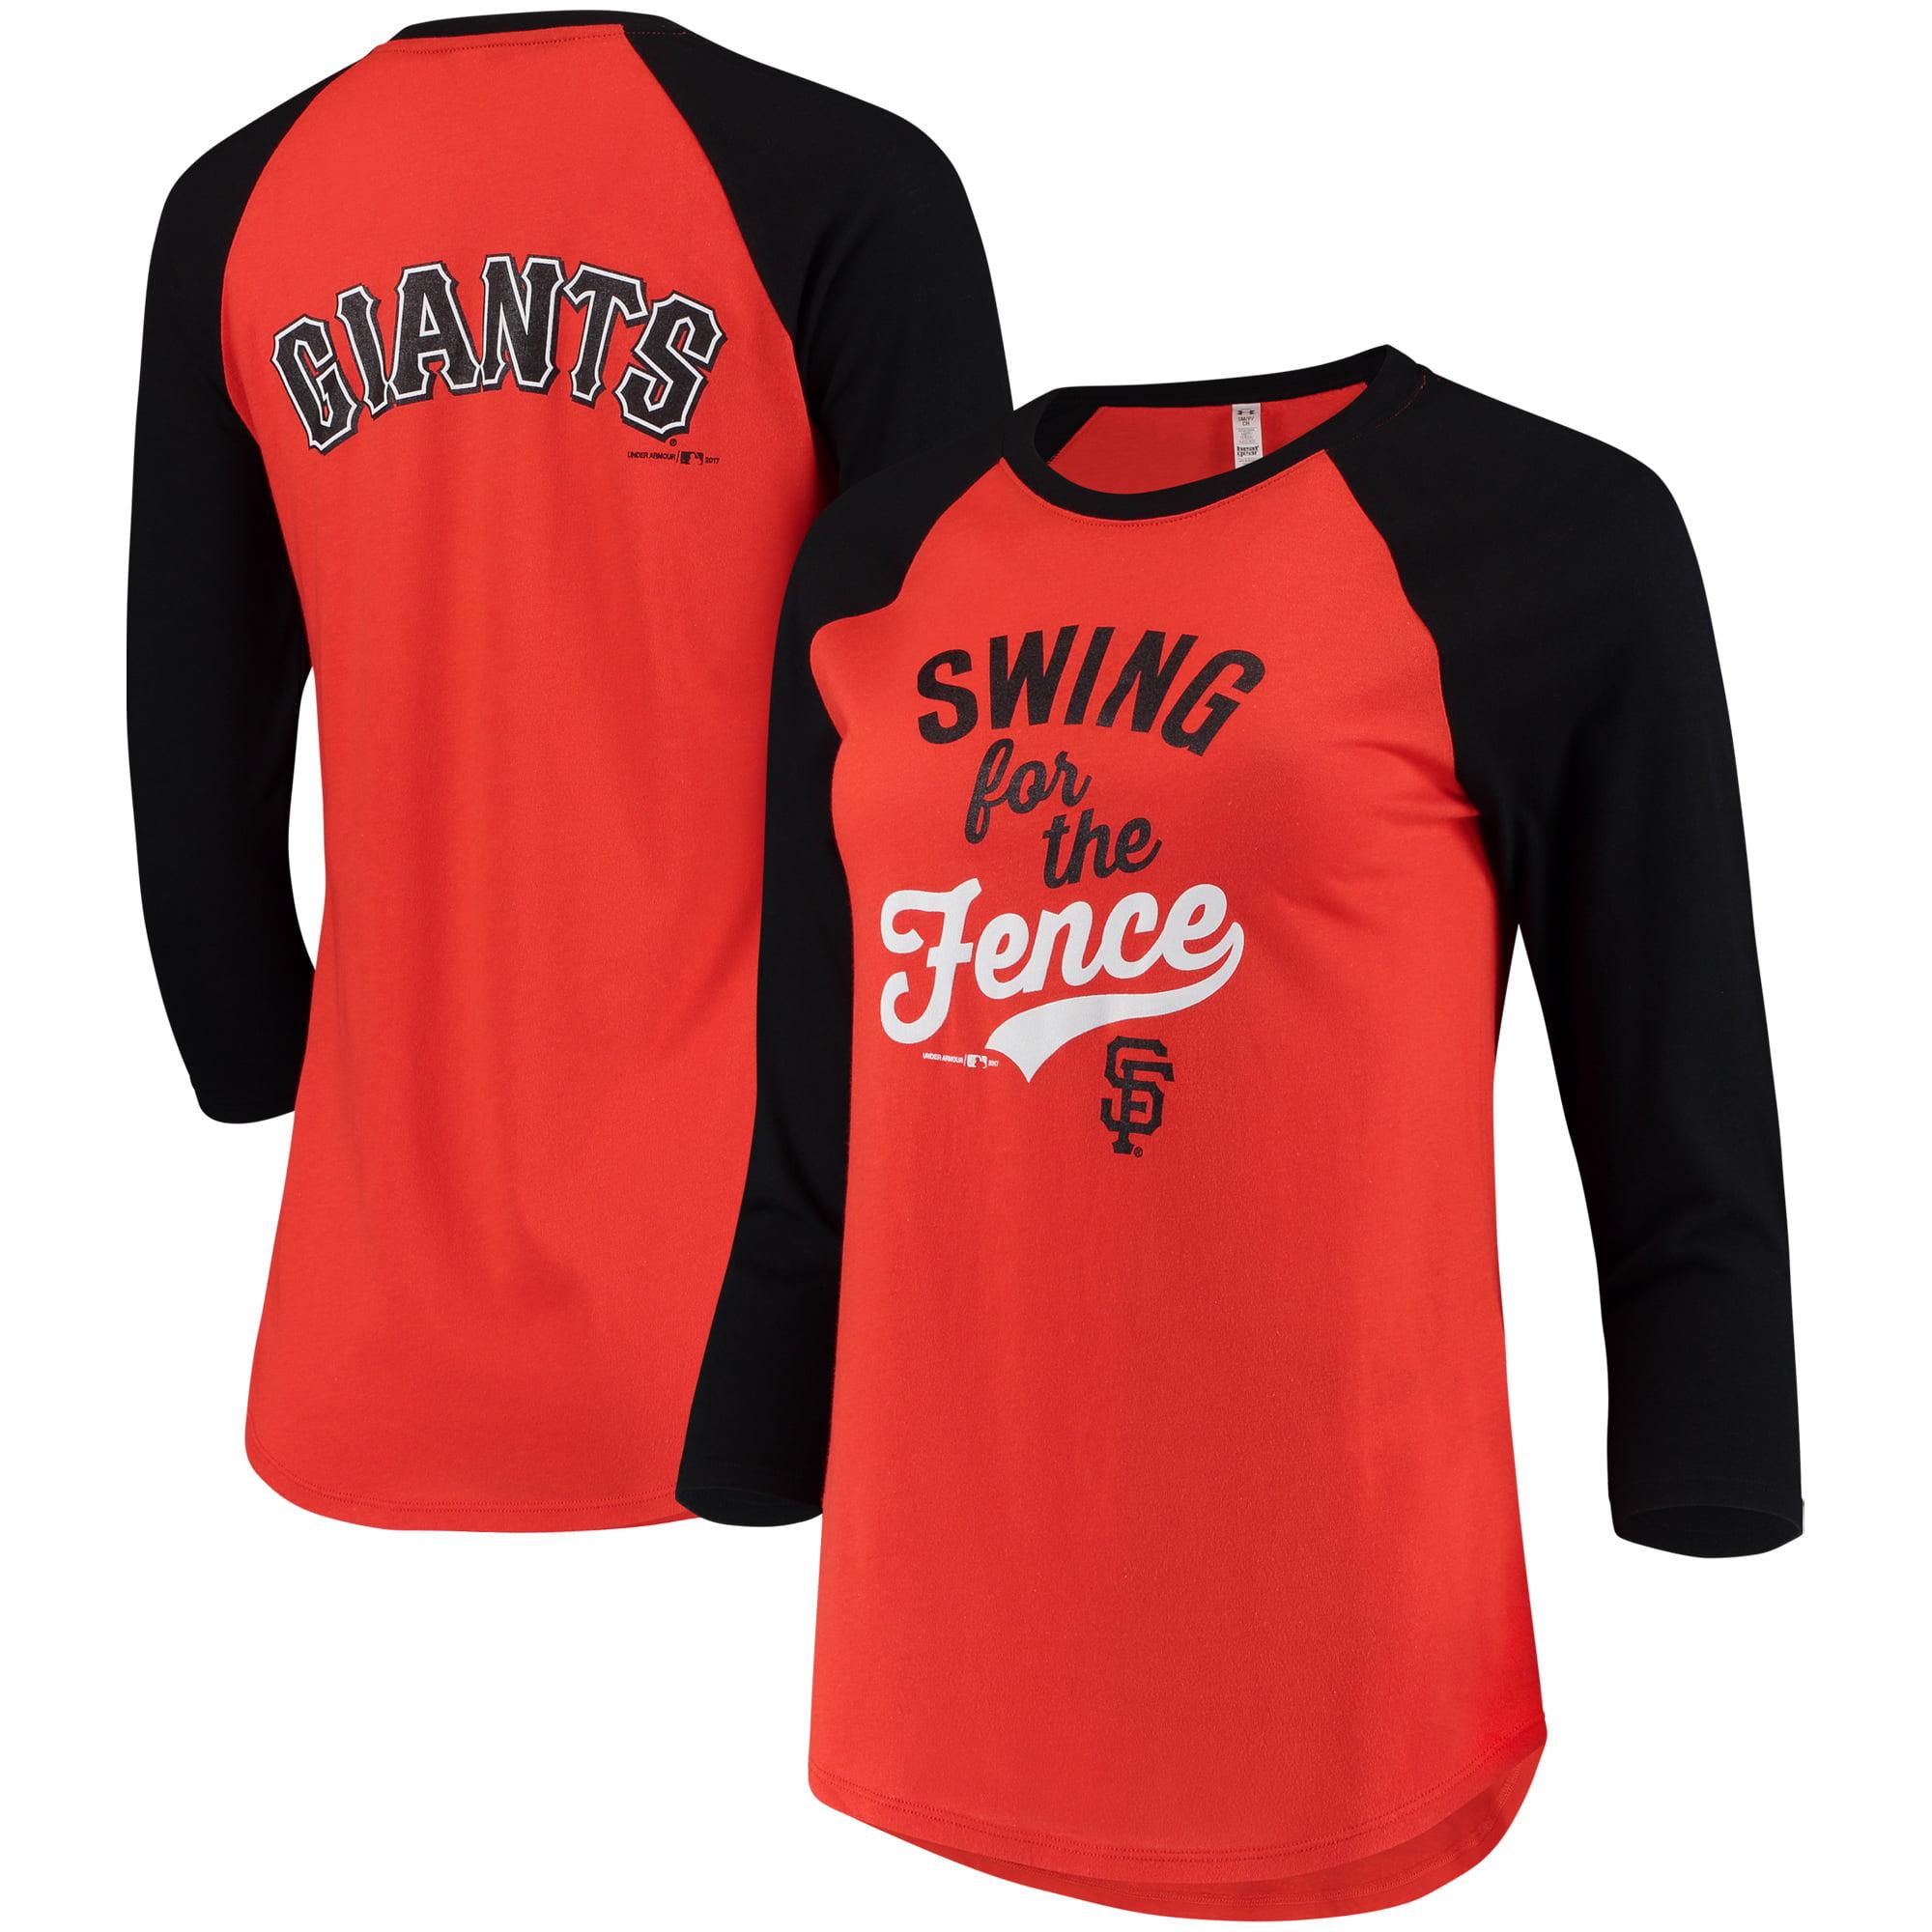 San Francisco Giants Under Armour Women's Baseball 3/4-Sleeve T-Shirt - Orange